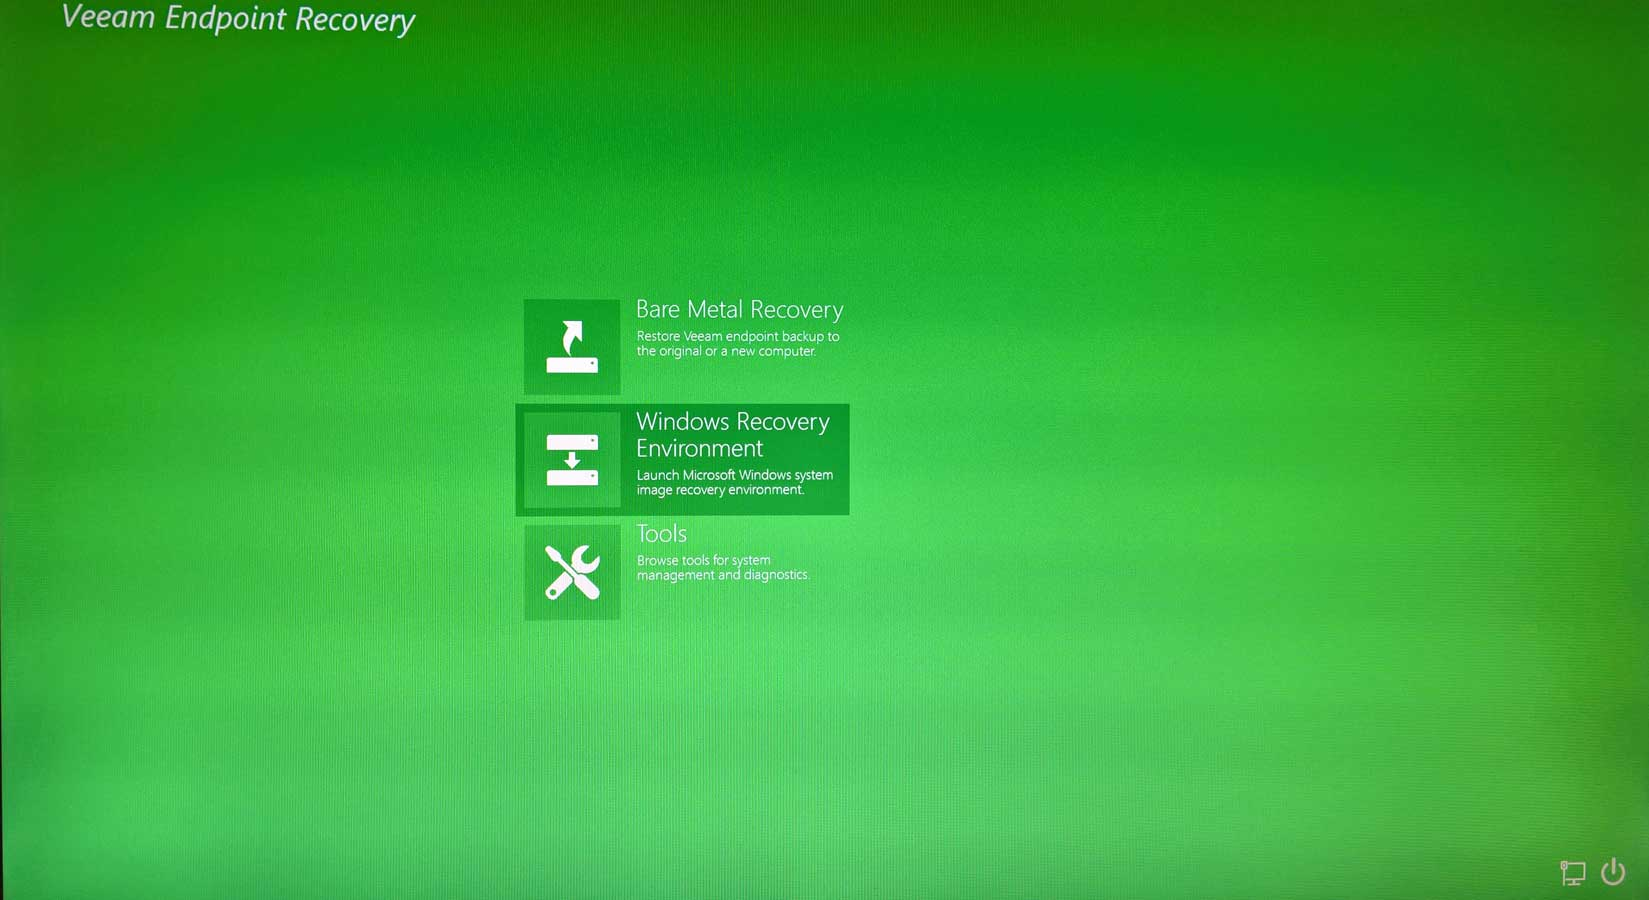 Veeam Recovery Begrüßungsbildschirm